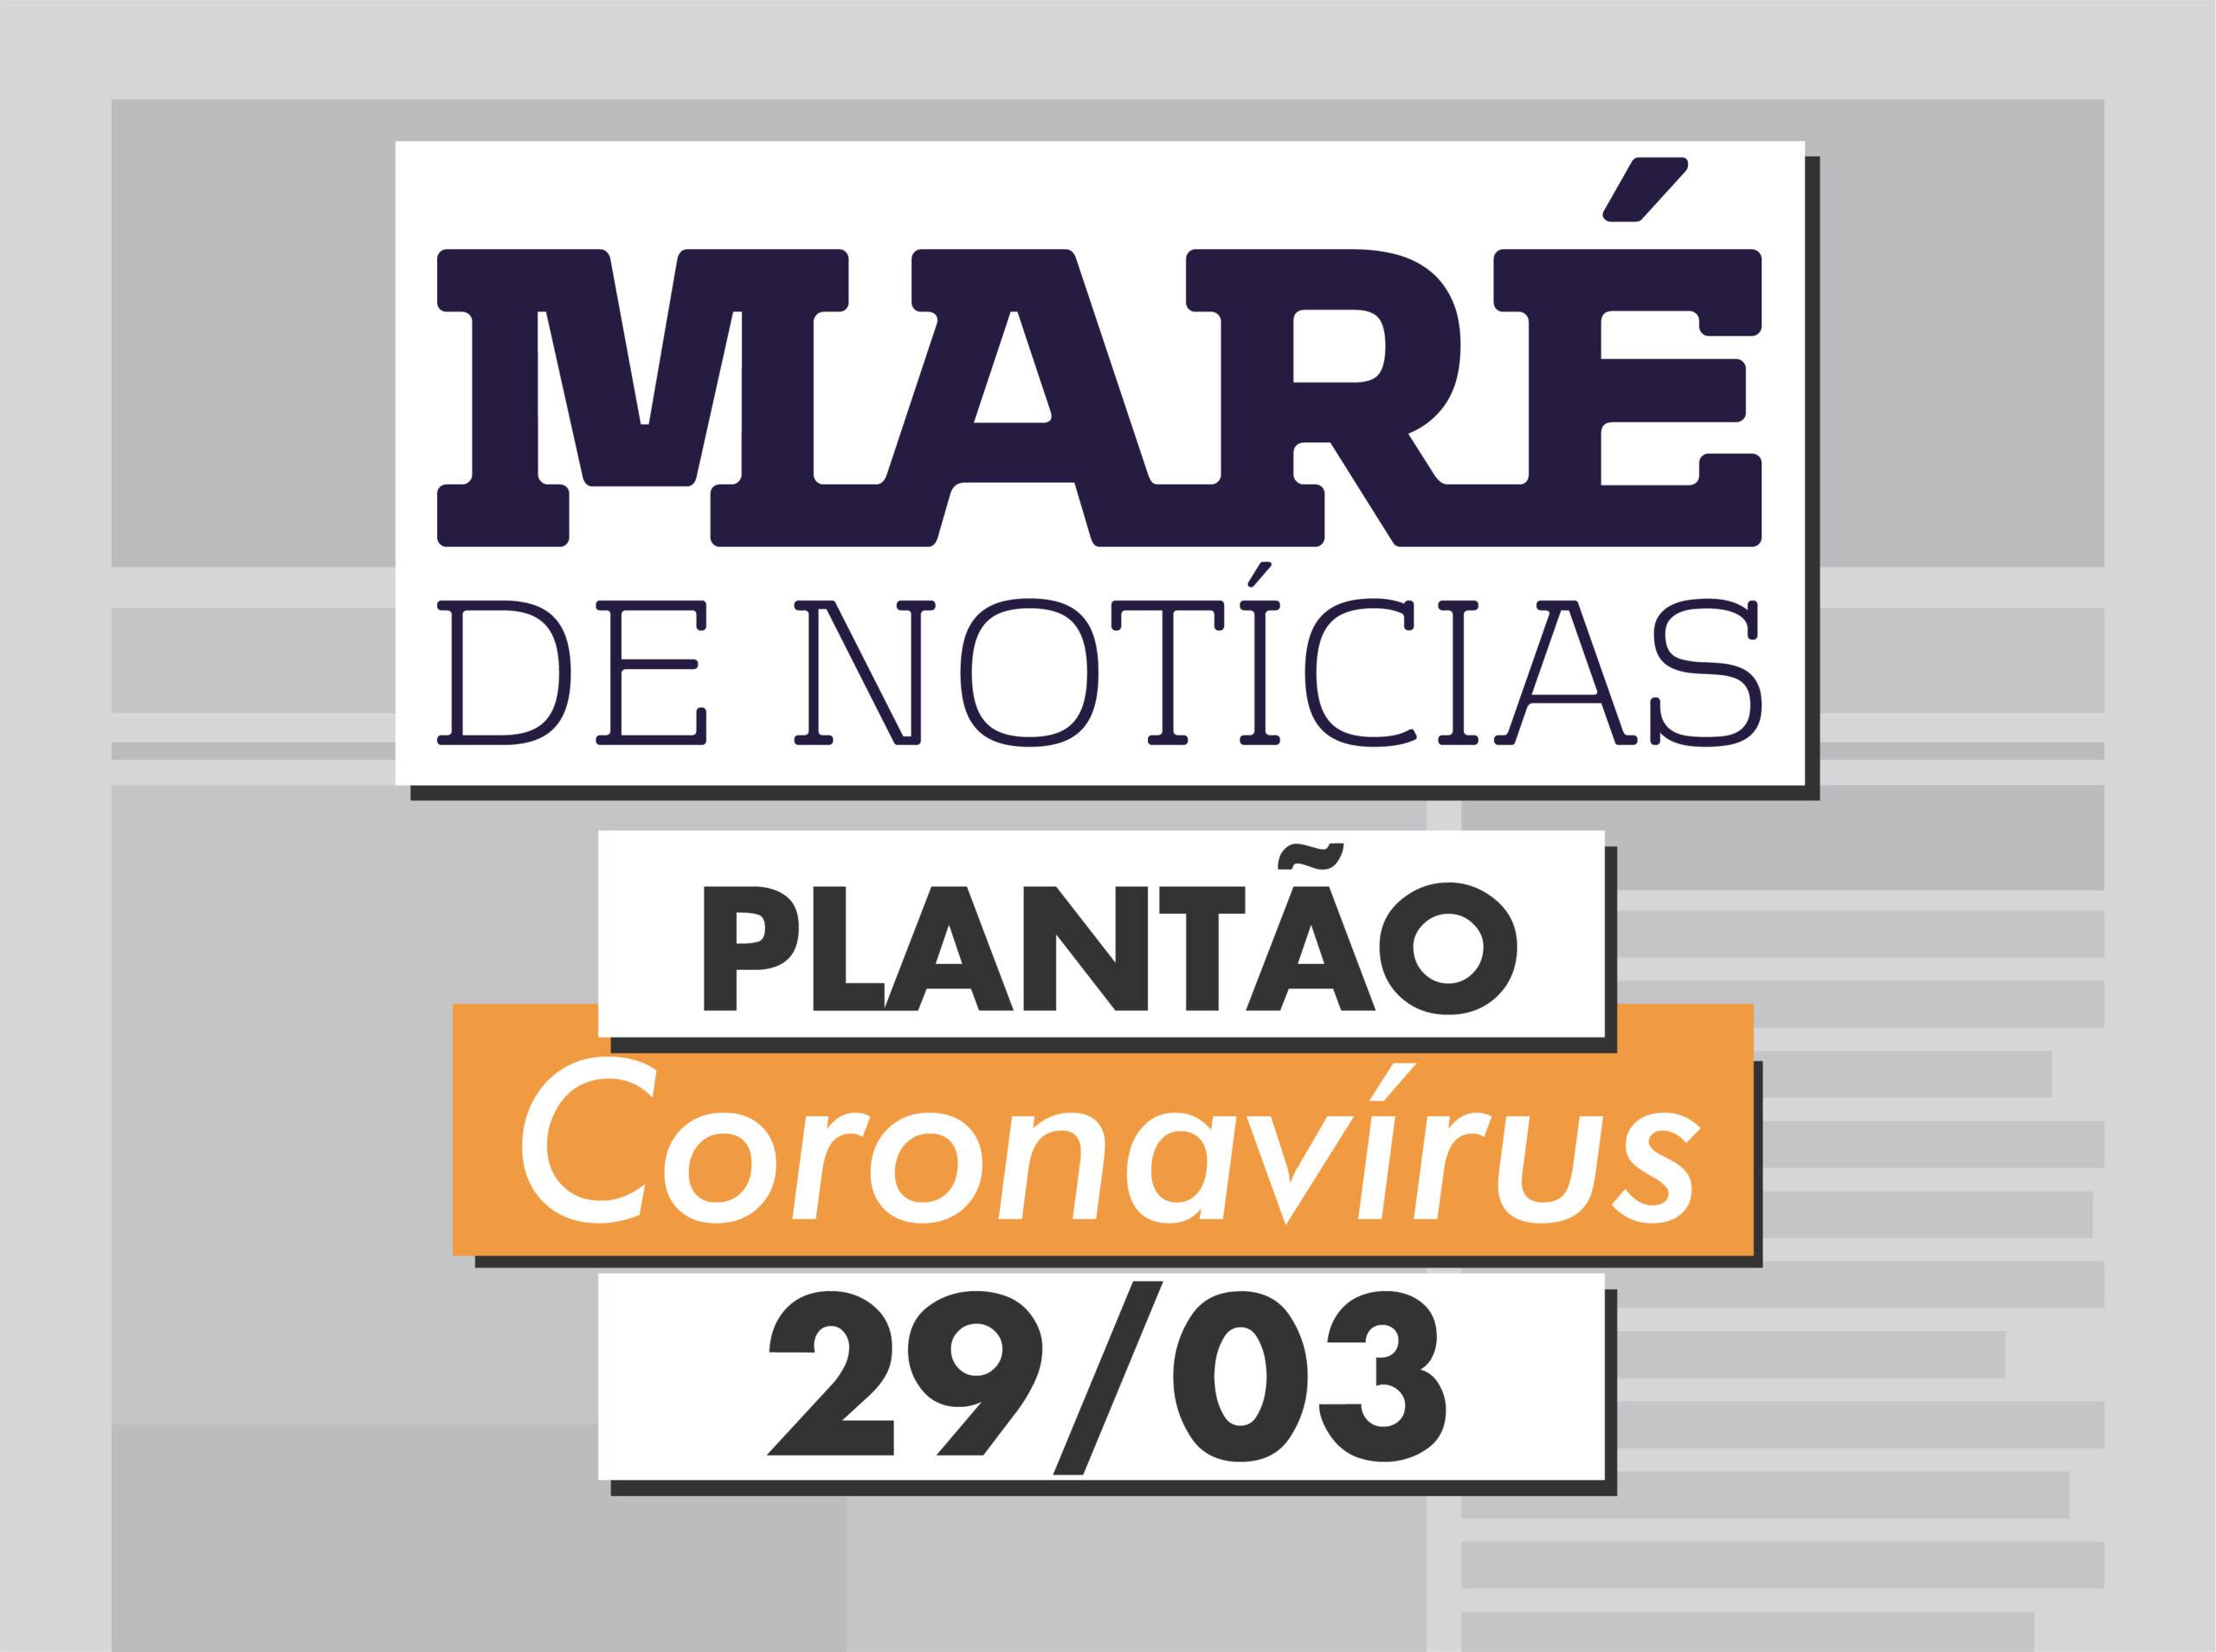 Ronda Coronavírus: Covid-19 chega a mais favelas do Rio